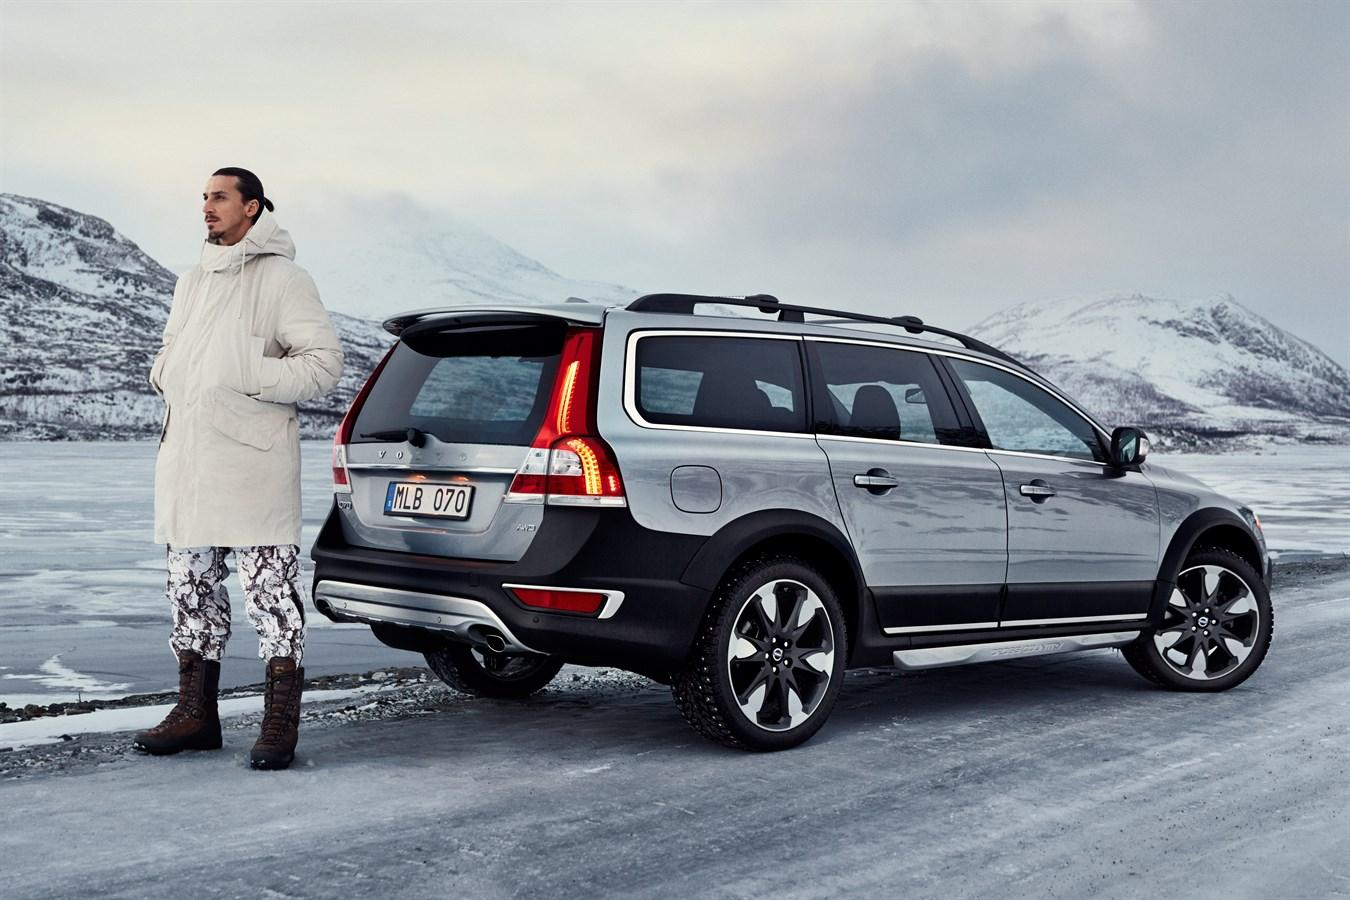 Photos Volvo XC60 image 7 furthermore Volvo Xc70 Anne Modle 2015 further Xc60 Schwarz Erakir2 I202836707 in addition Krone Ultima Cf 155 Xc Black Wrap moreover Volvo Xc40 Mula. on 2015 volvo xc